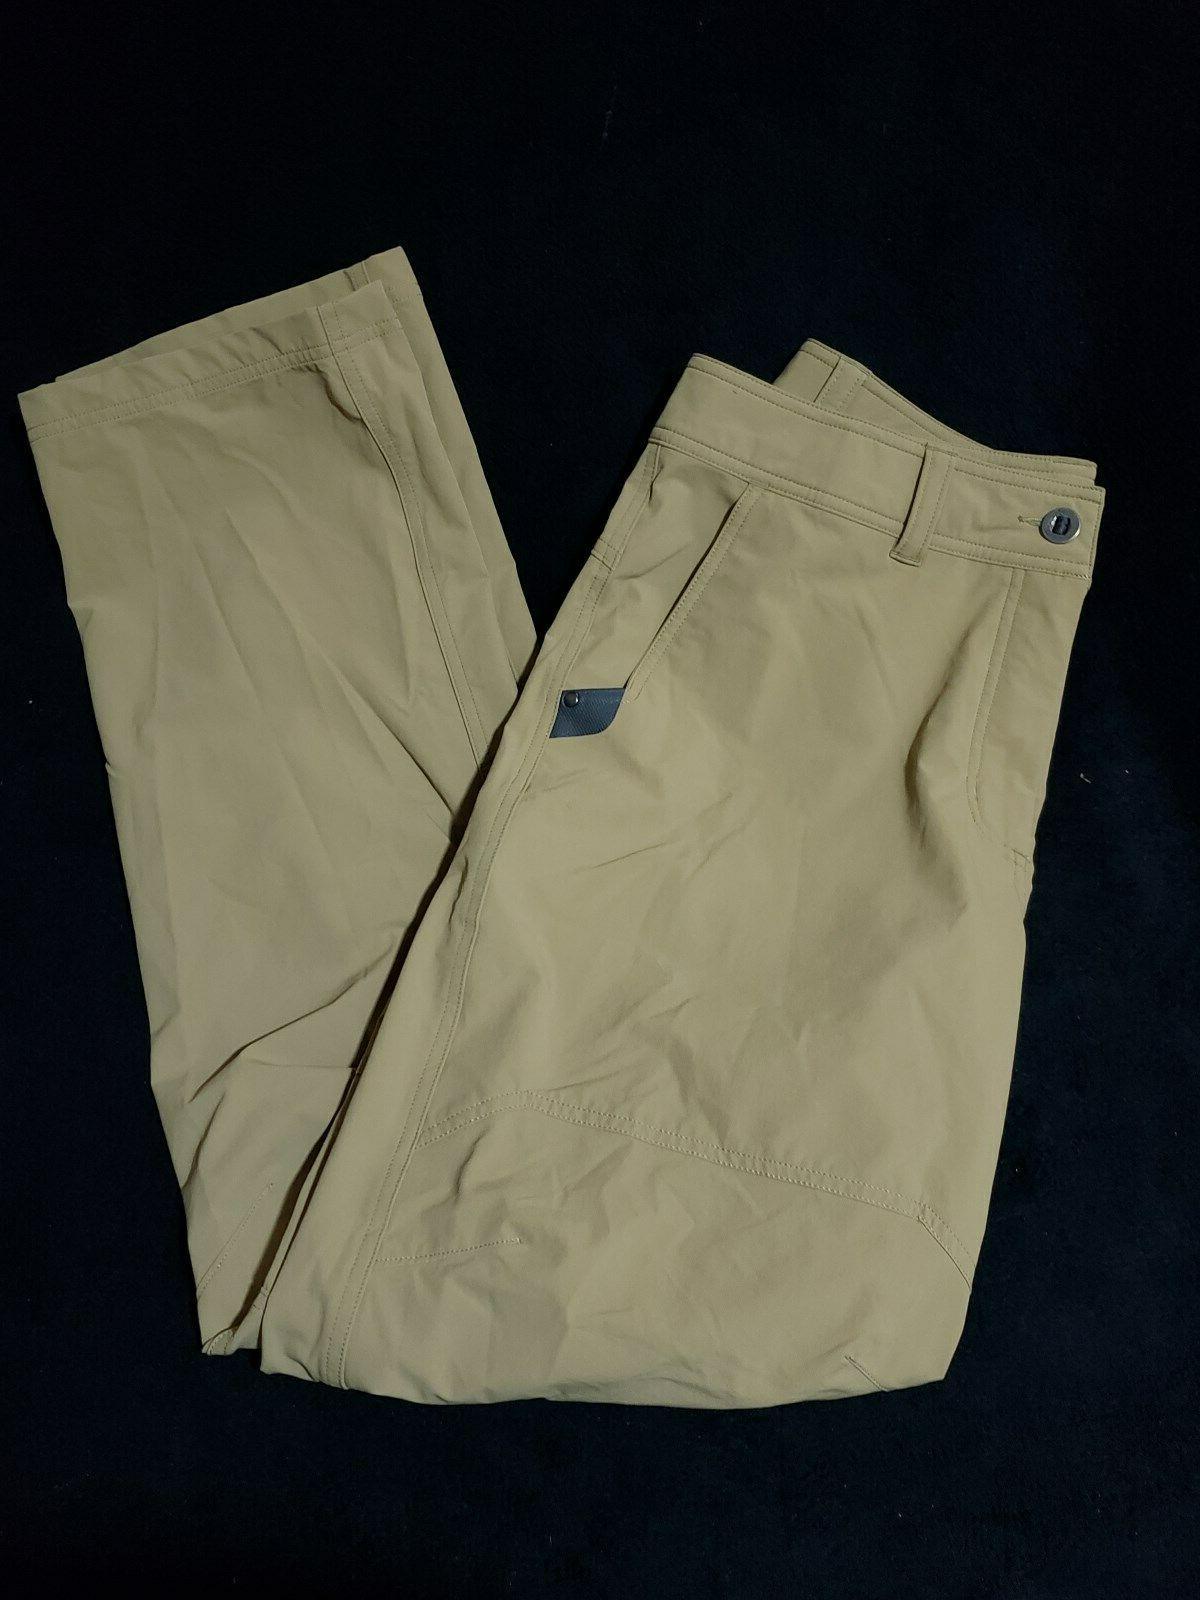 NWOT GEAR Men's Hiking Hunting Pants Size 36T